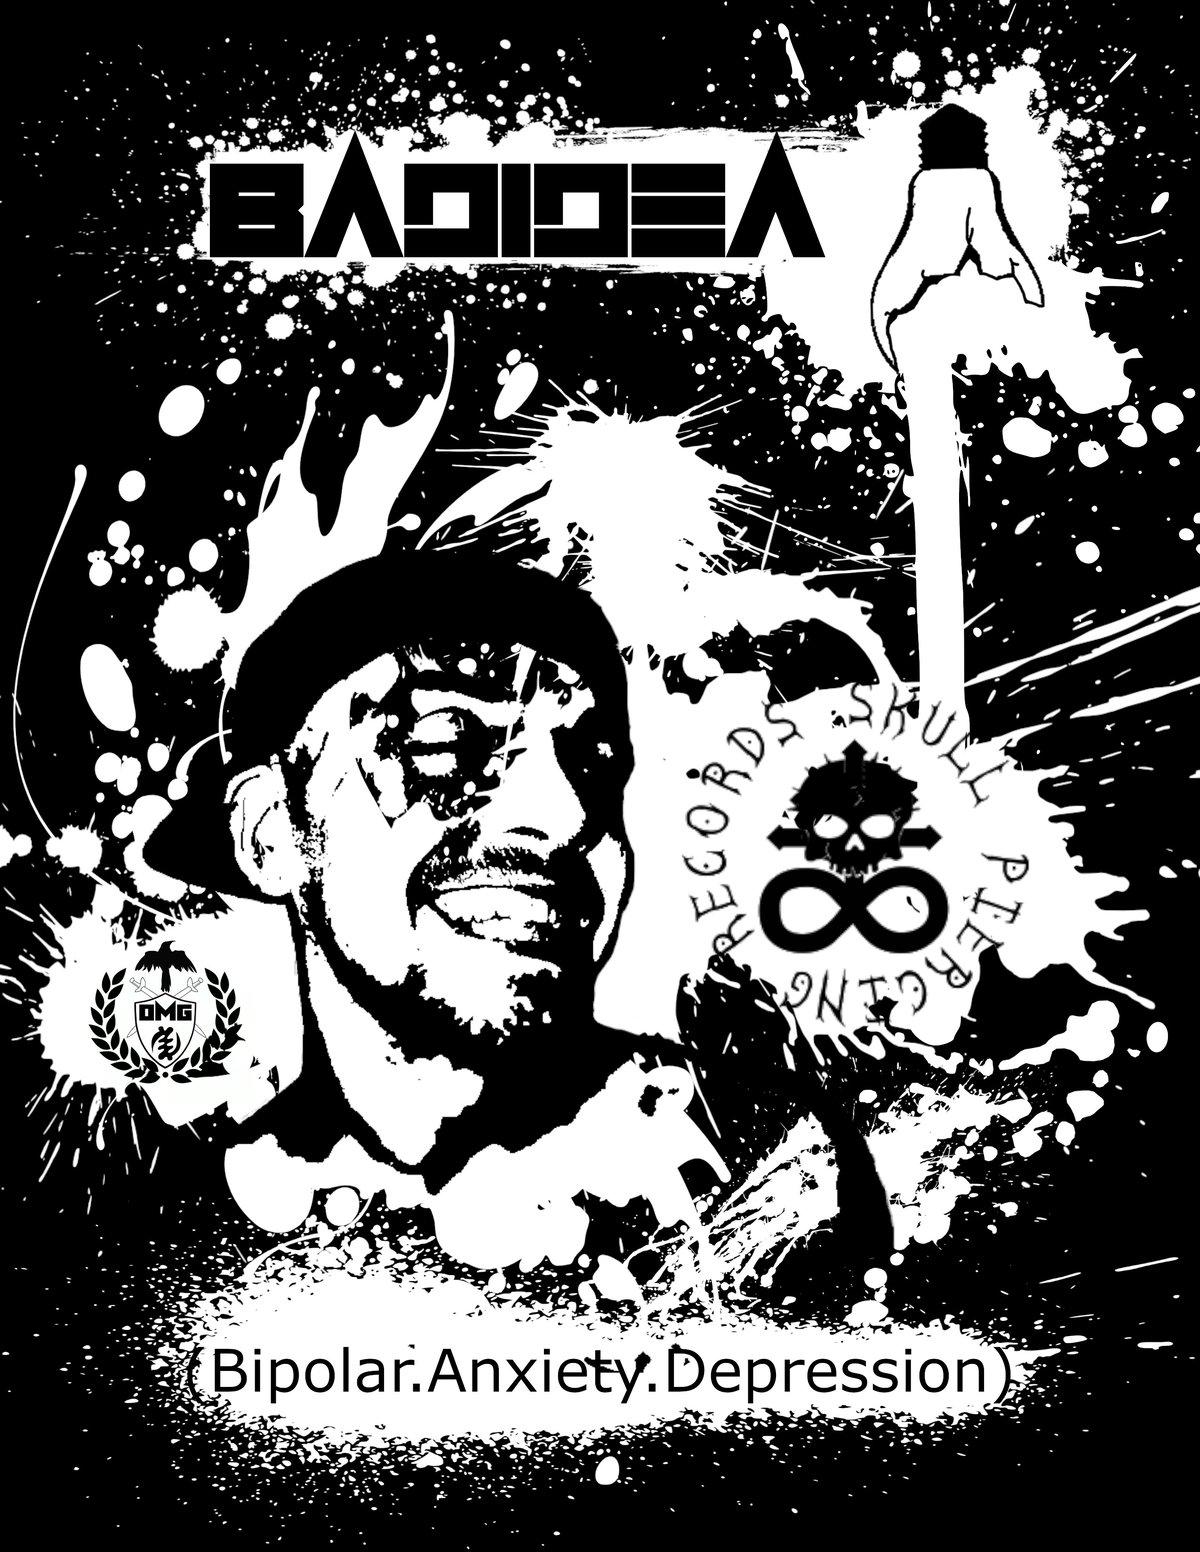 BadIdea - (Bipolar.Anxiety.Depression) T Shirt